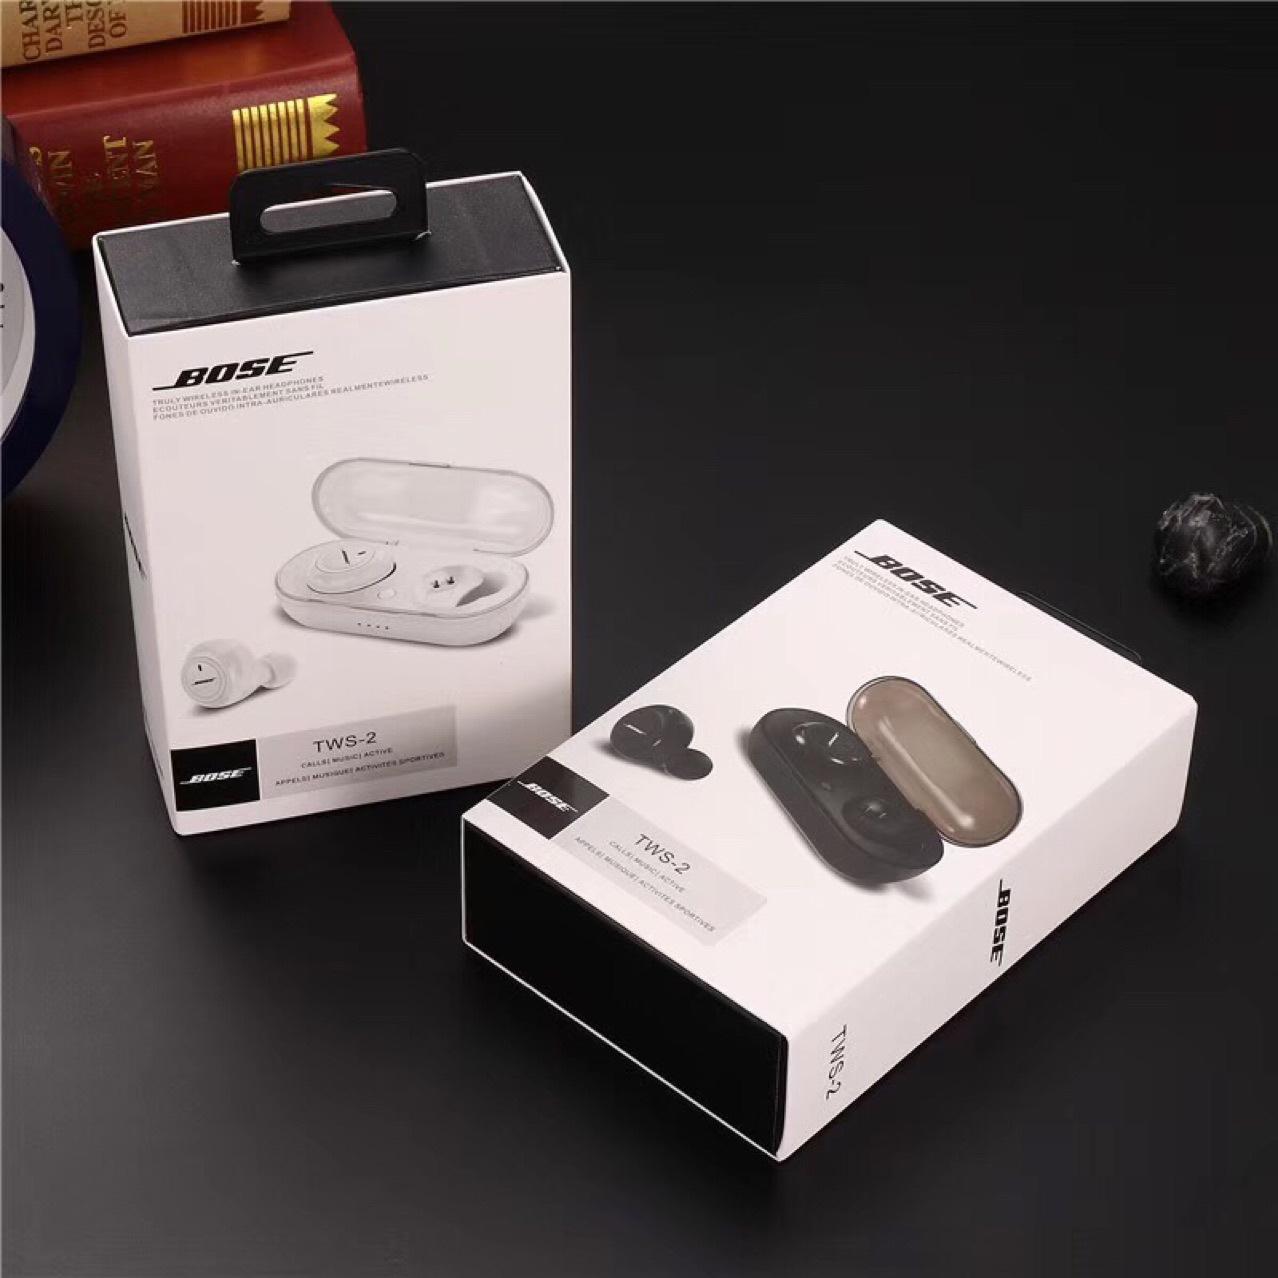 Tai nghe Bluetooth TWS-2 V5.0